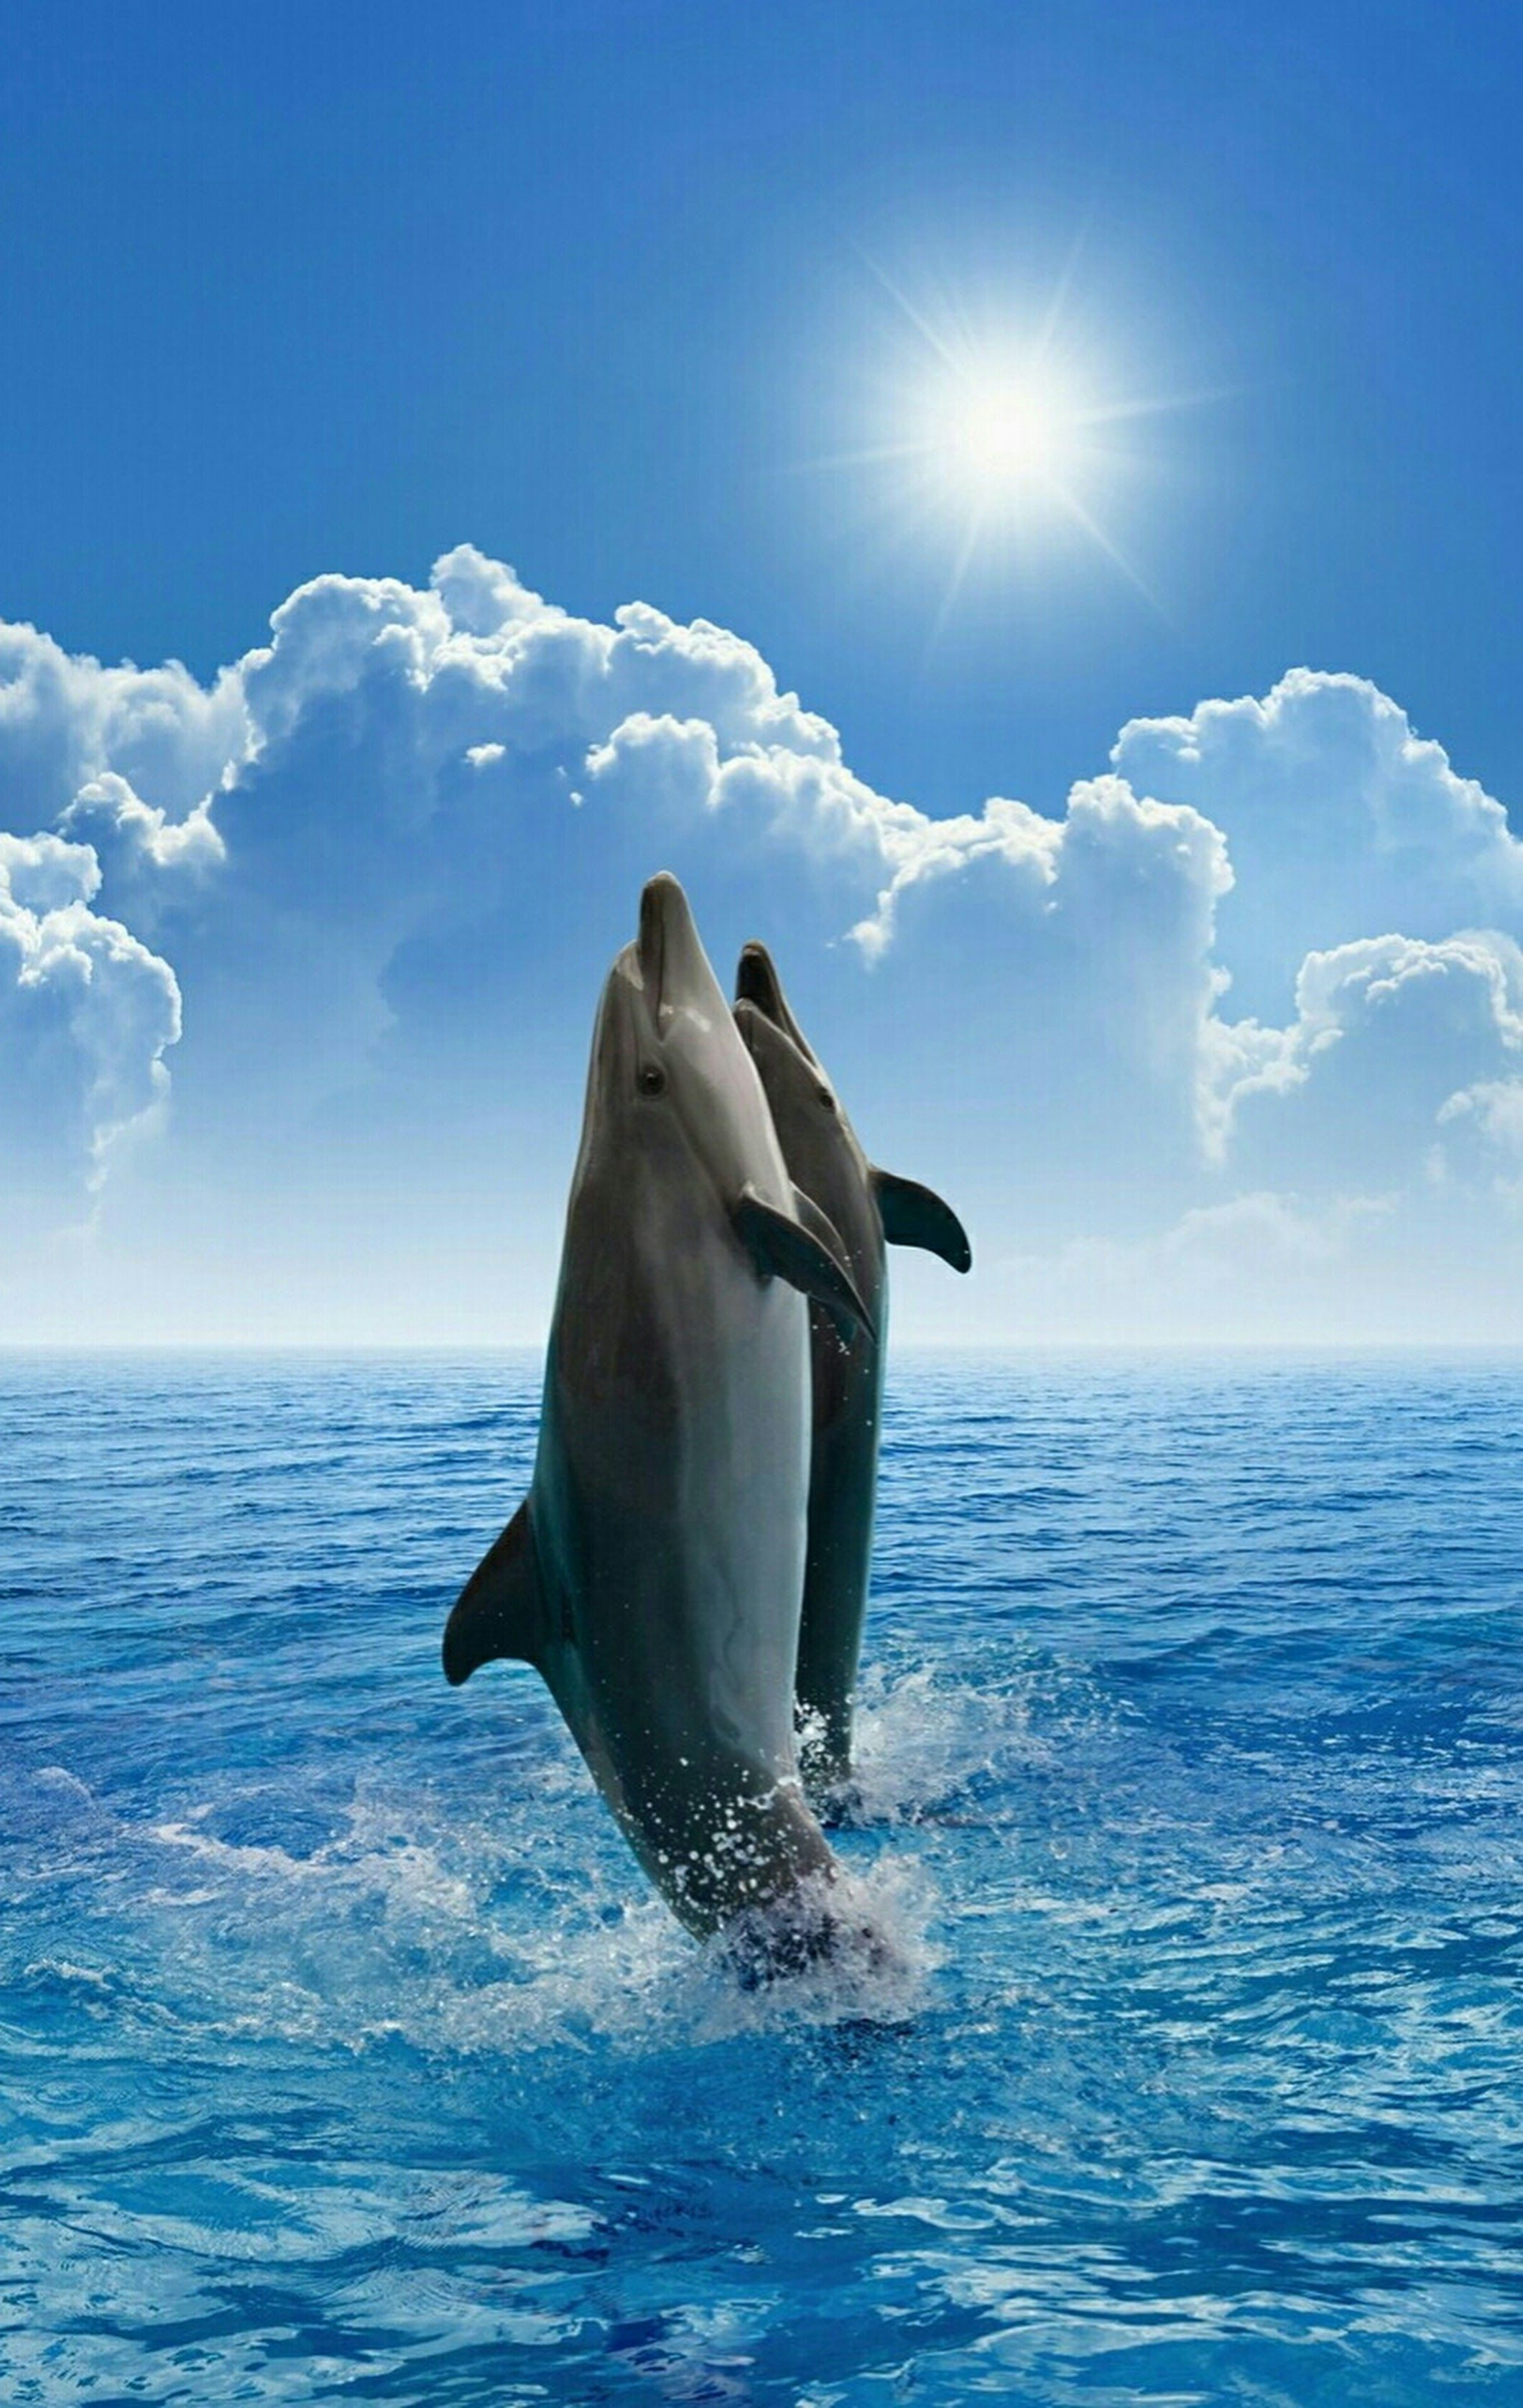 Lovely Dolphin ,,,,,,,,, Halimah Nur Google+